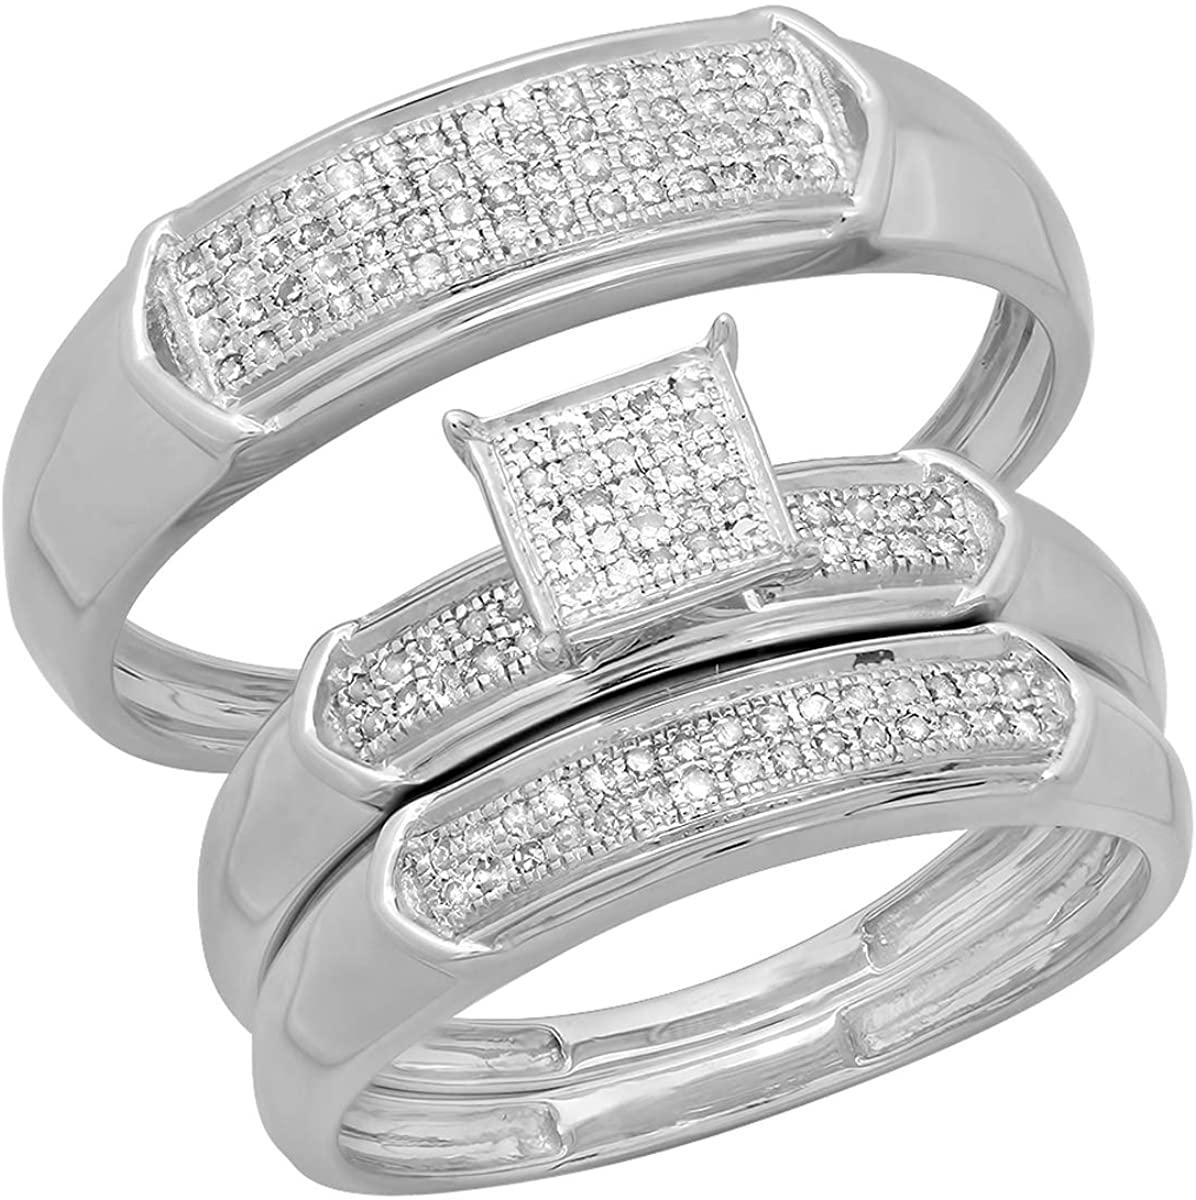 Dazzlingrock Collection 0.30 Carat (ctw) Round White Diamond Men & Women's Micro Pave Trio Bridal Wedding Set 1/3 CT, 10K White Gold